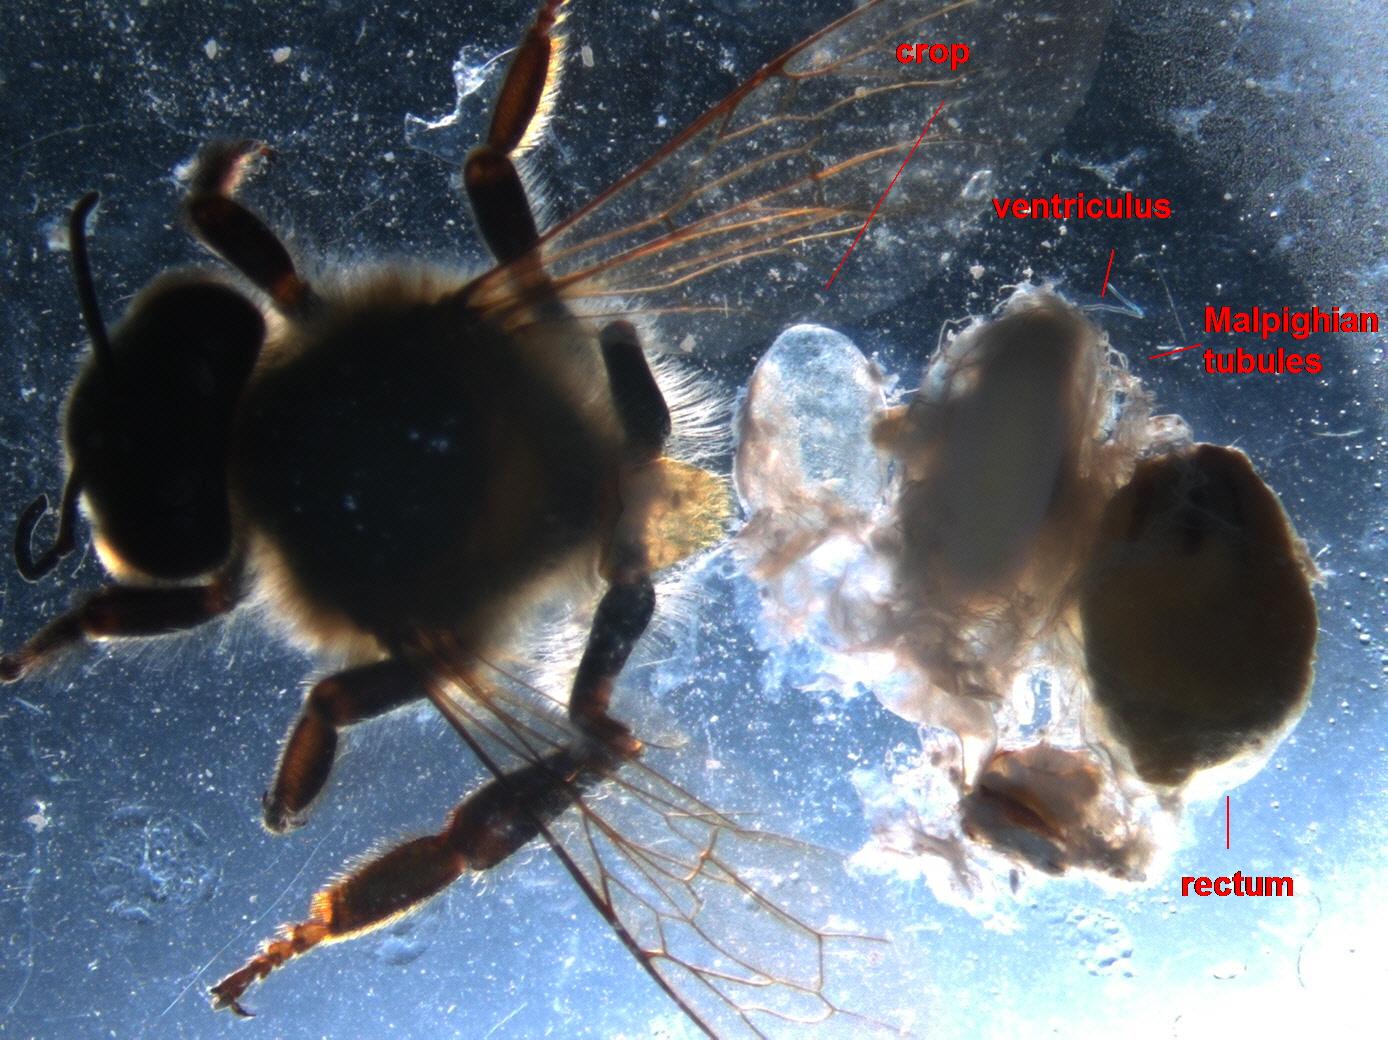 http://beeinformed.org/2013/07/bee-guts/